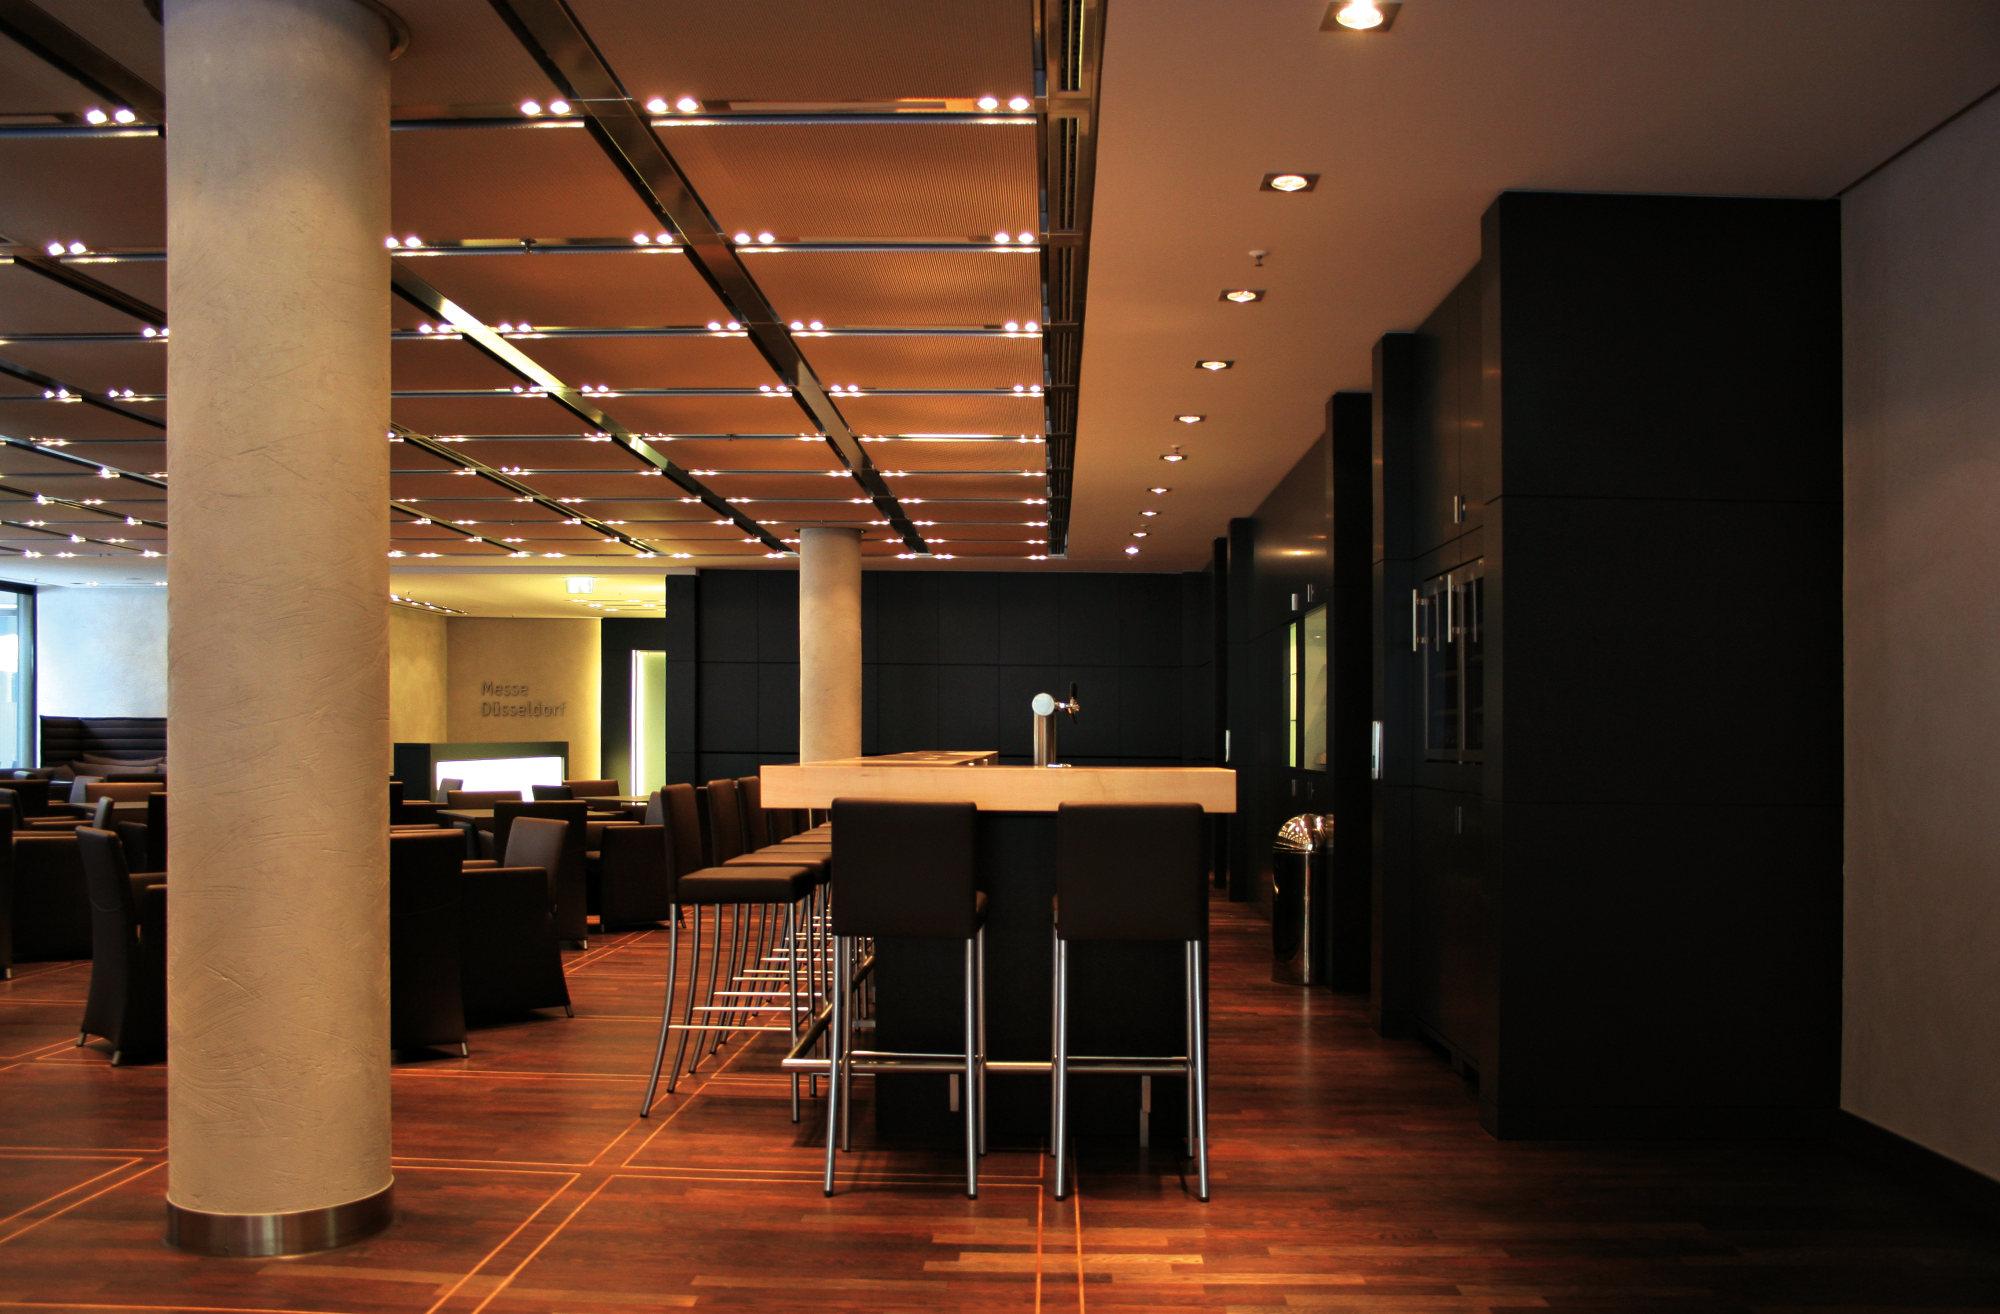 vip g steclub messe d sseldorf legno werkst tte f r. Black Bedroom Furniture Sets. Home Design Ideas